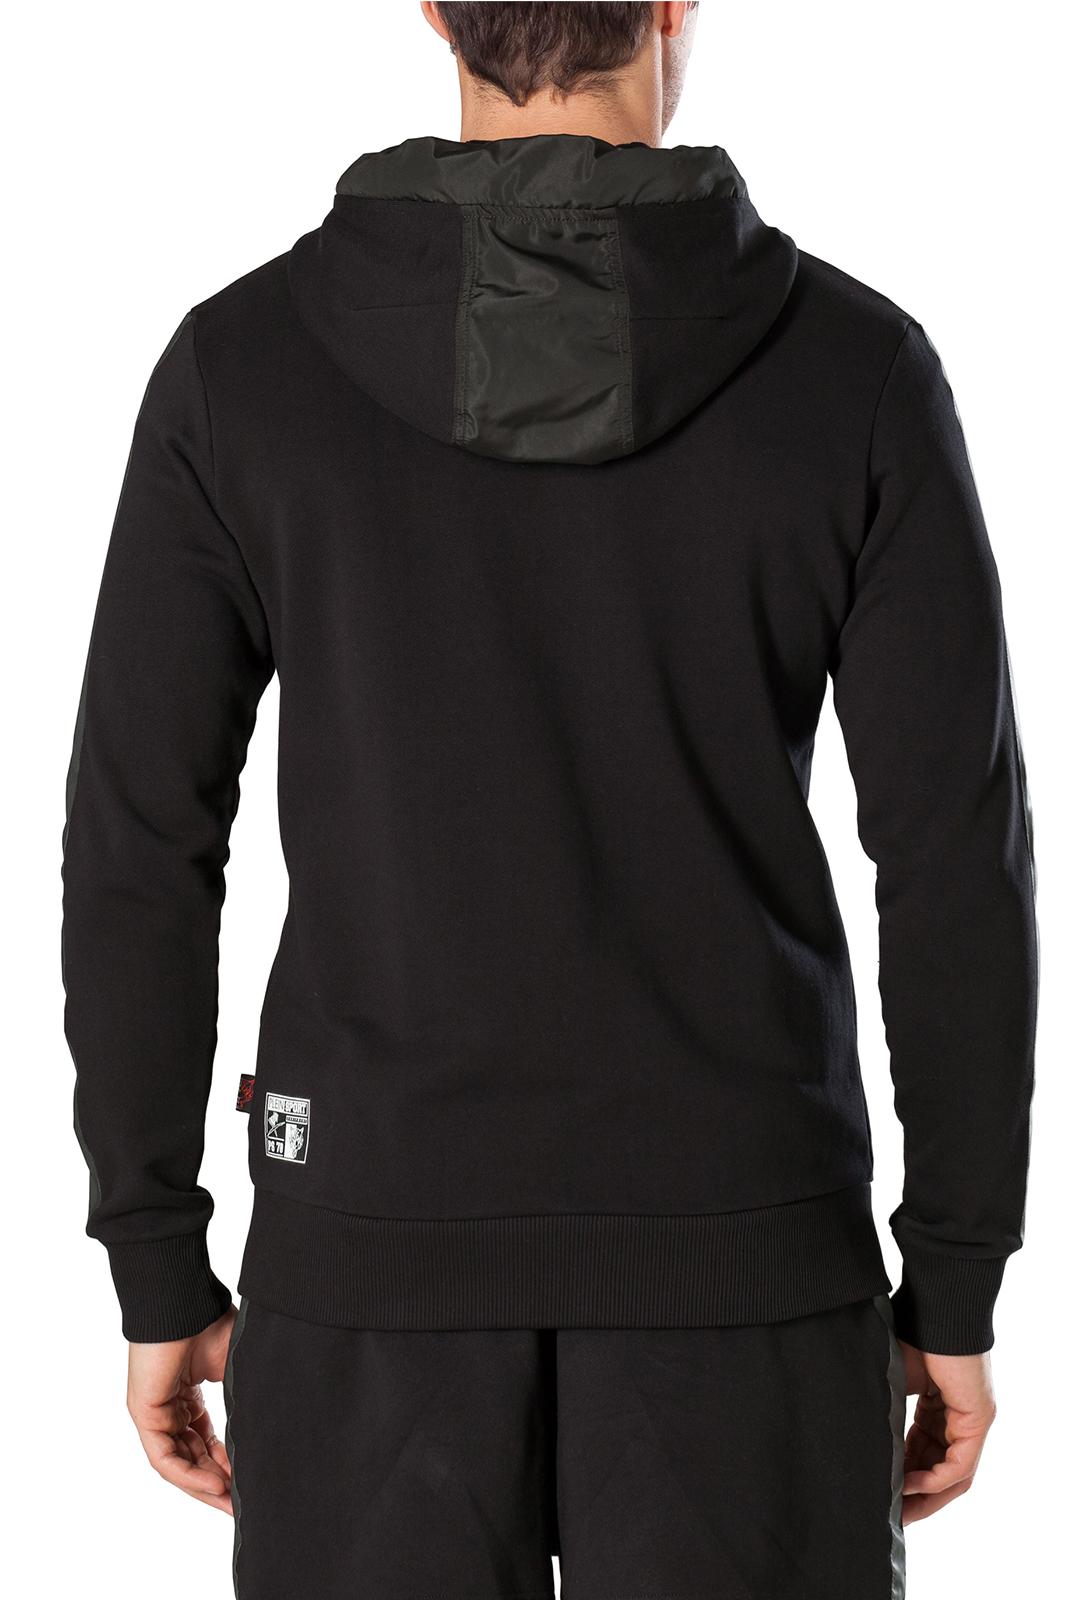 Vestes zippées  Plein Sport F17C MJB0143 02 BLACK